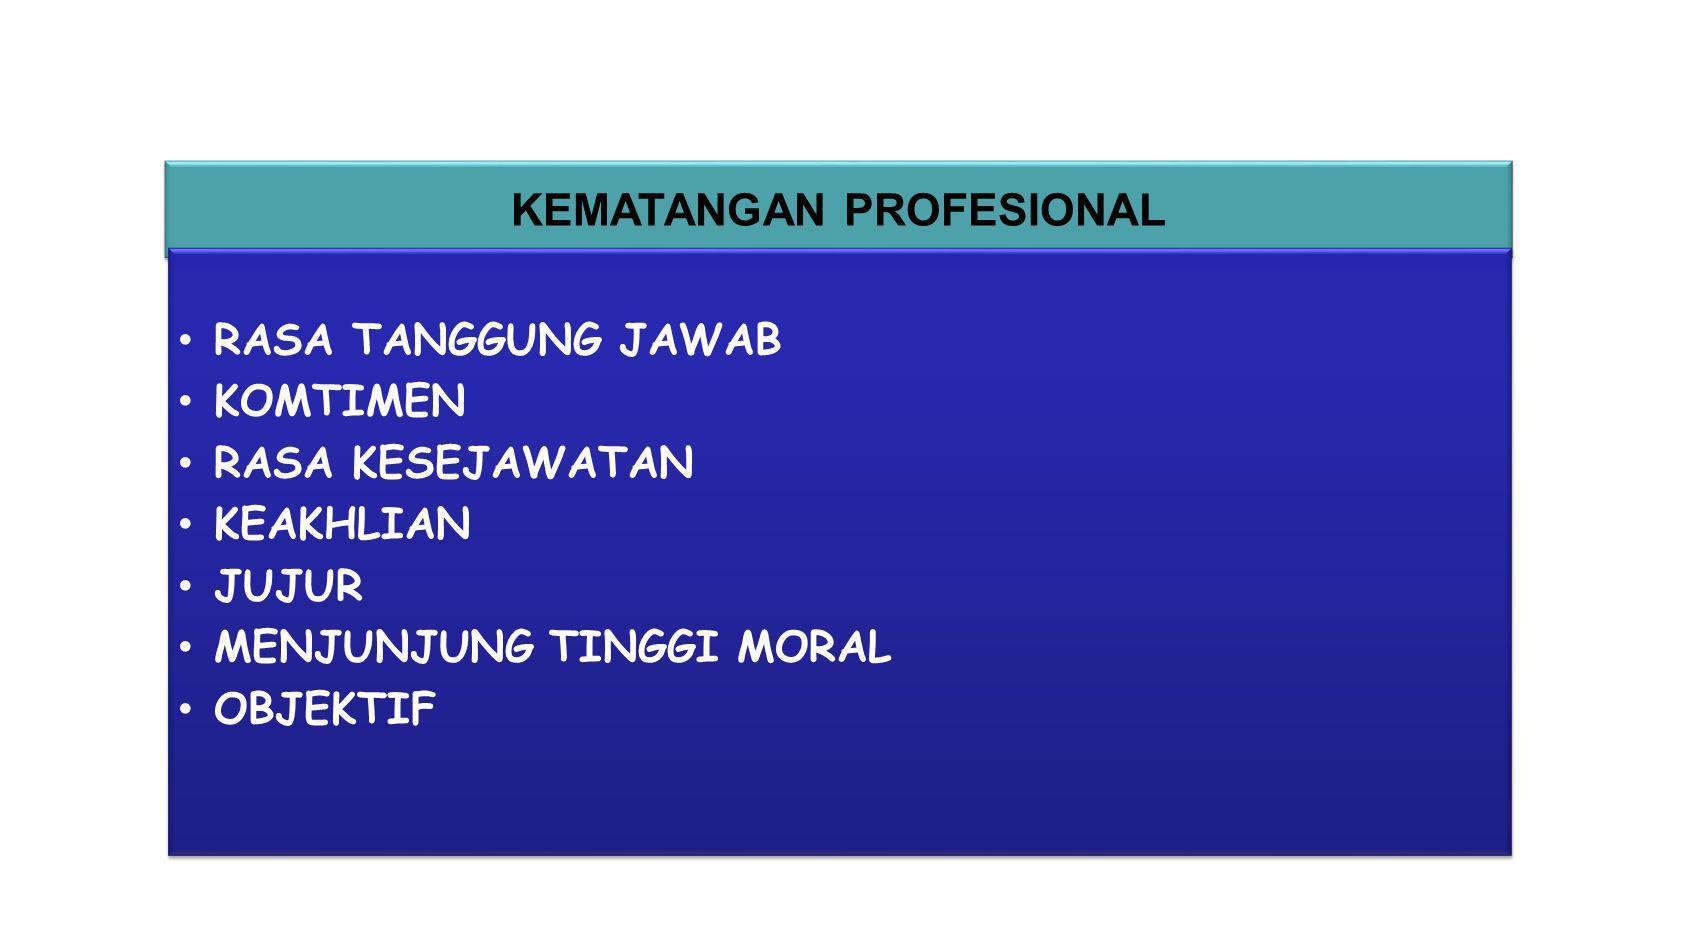 Bagaimana Sosok Kompetensi Konselor Profesional ?